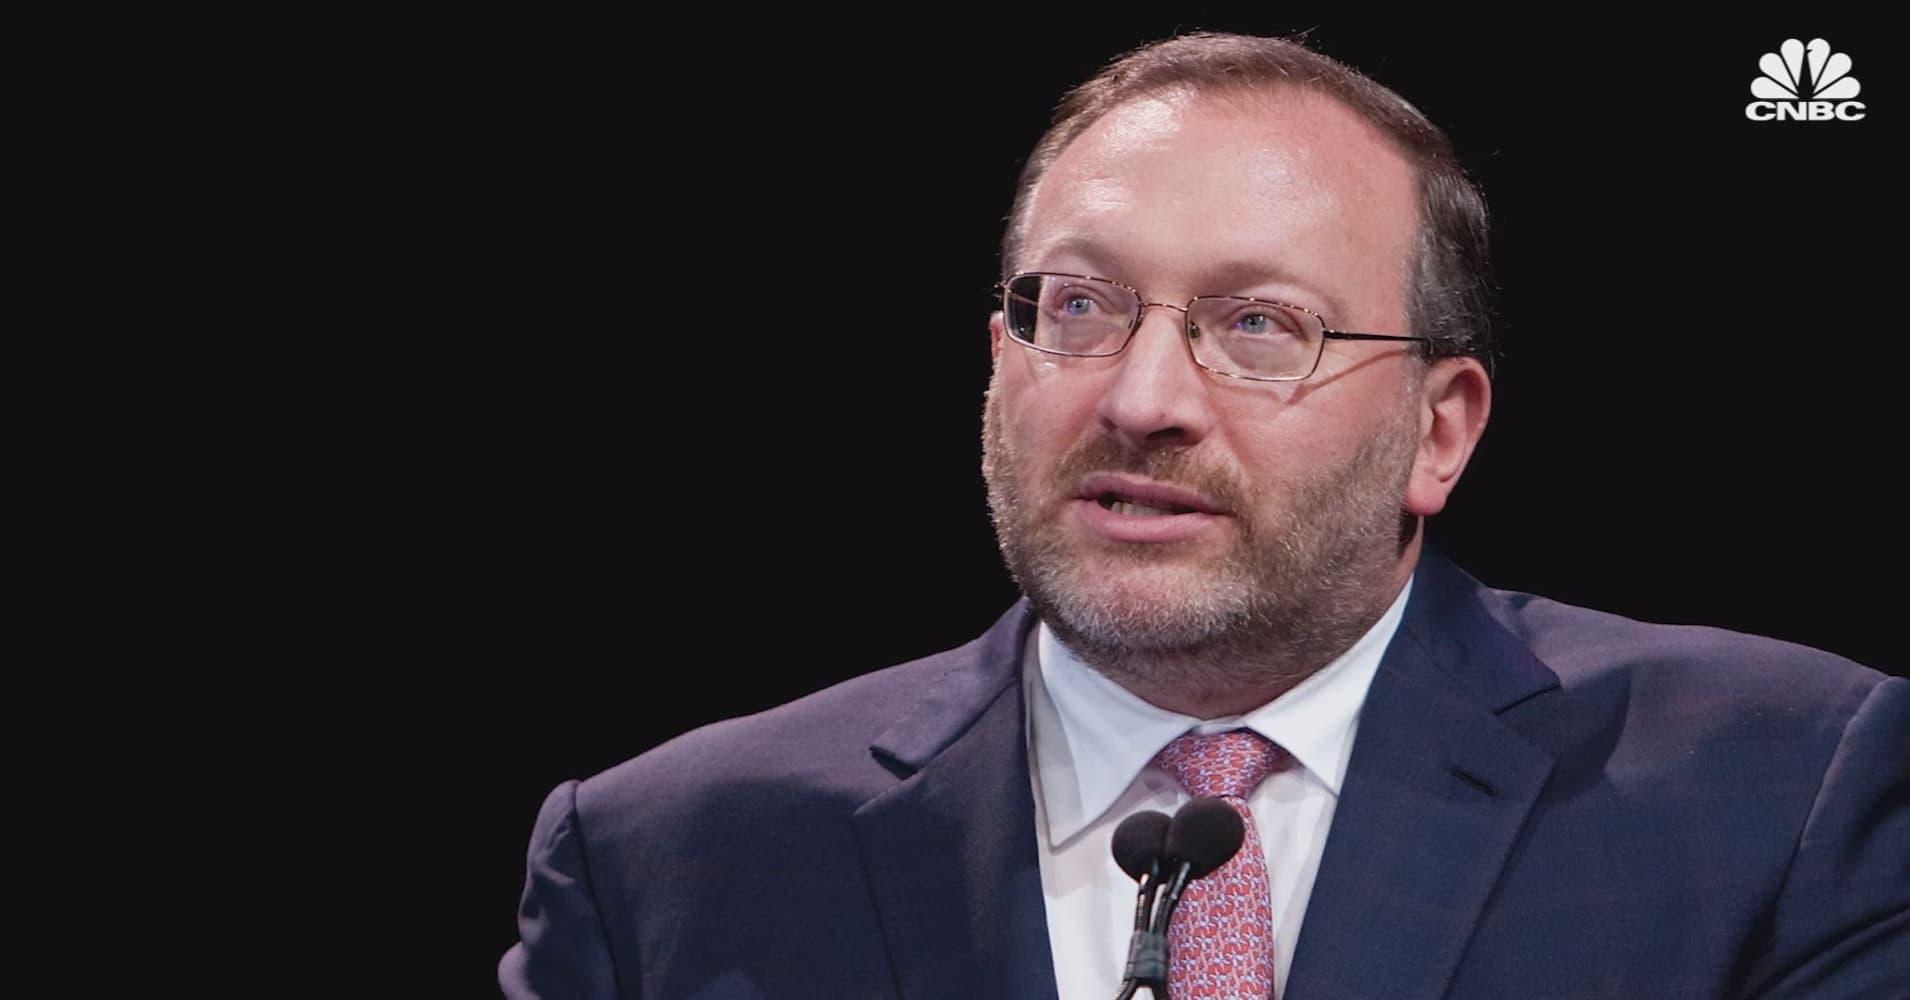 Hedge fund billionaire Seth Klarman warns of next financial crisis – Dalio, Sorenson, Schwarzman respond